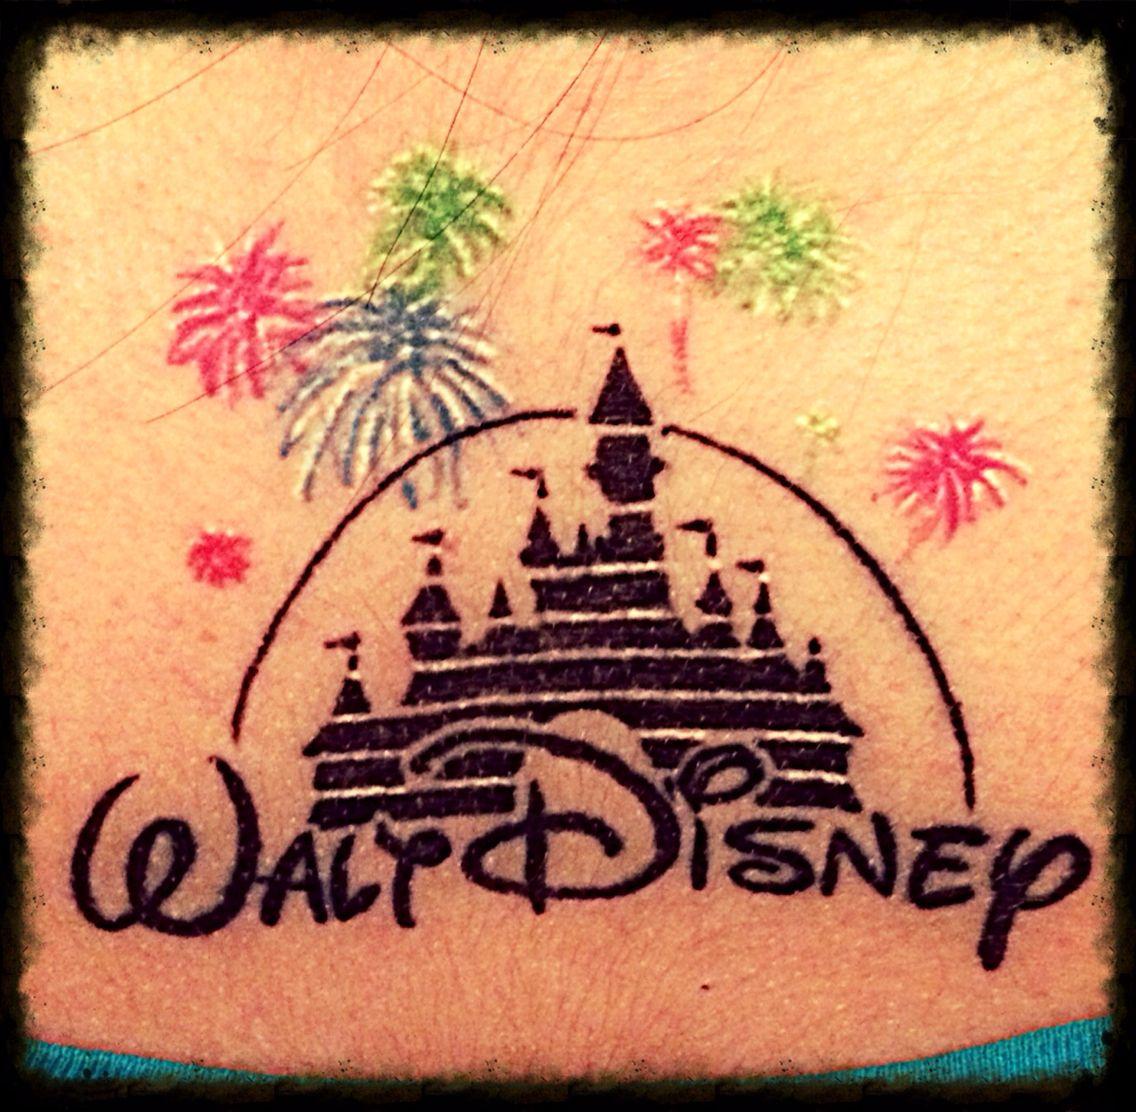 disney castle tattoo tattoos pinterest disney tatuaggio di castello disney e tatuaggio. Black Bedroom Furniture Sets. Home Design Ideas